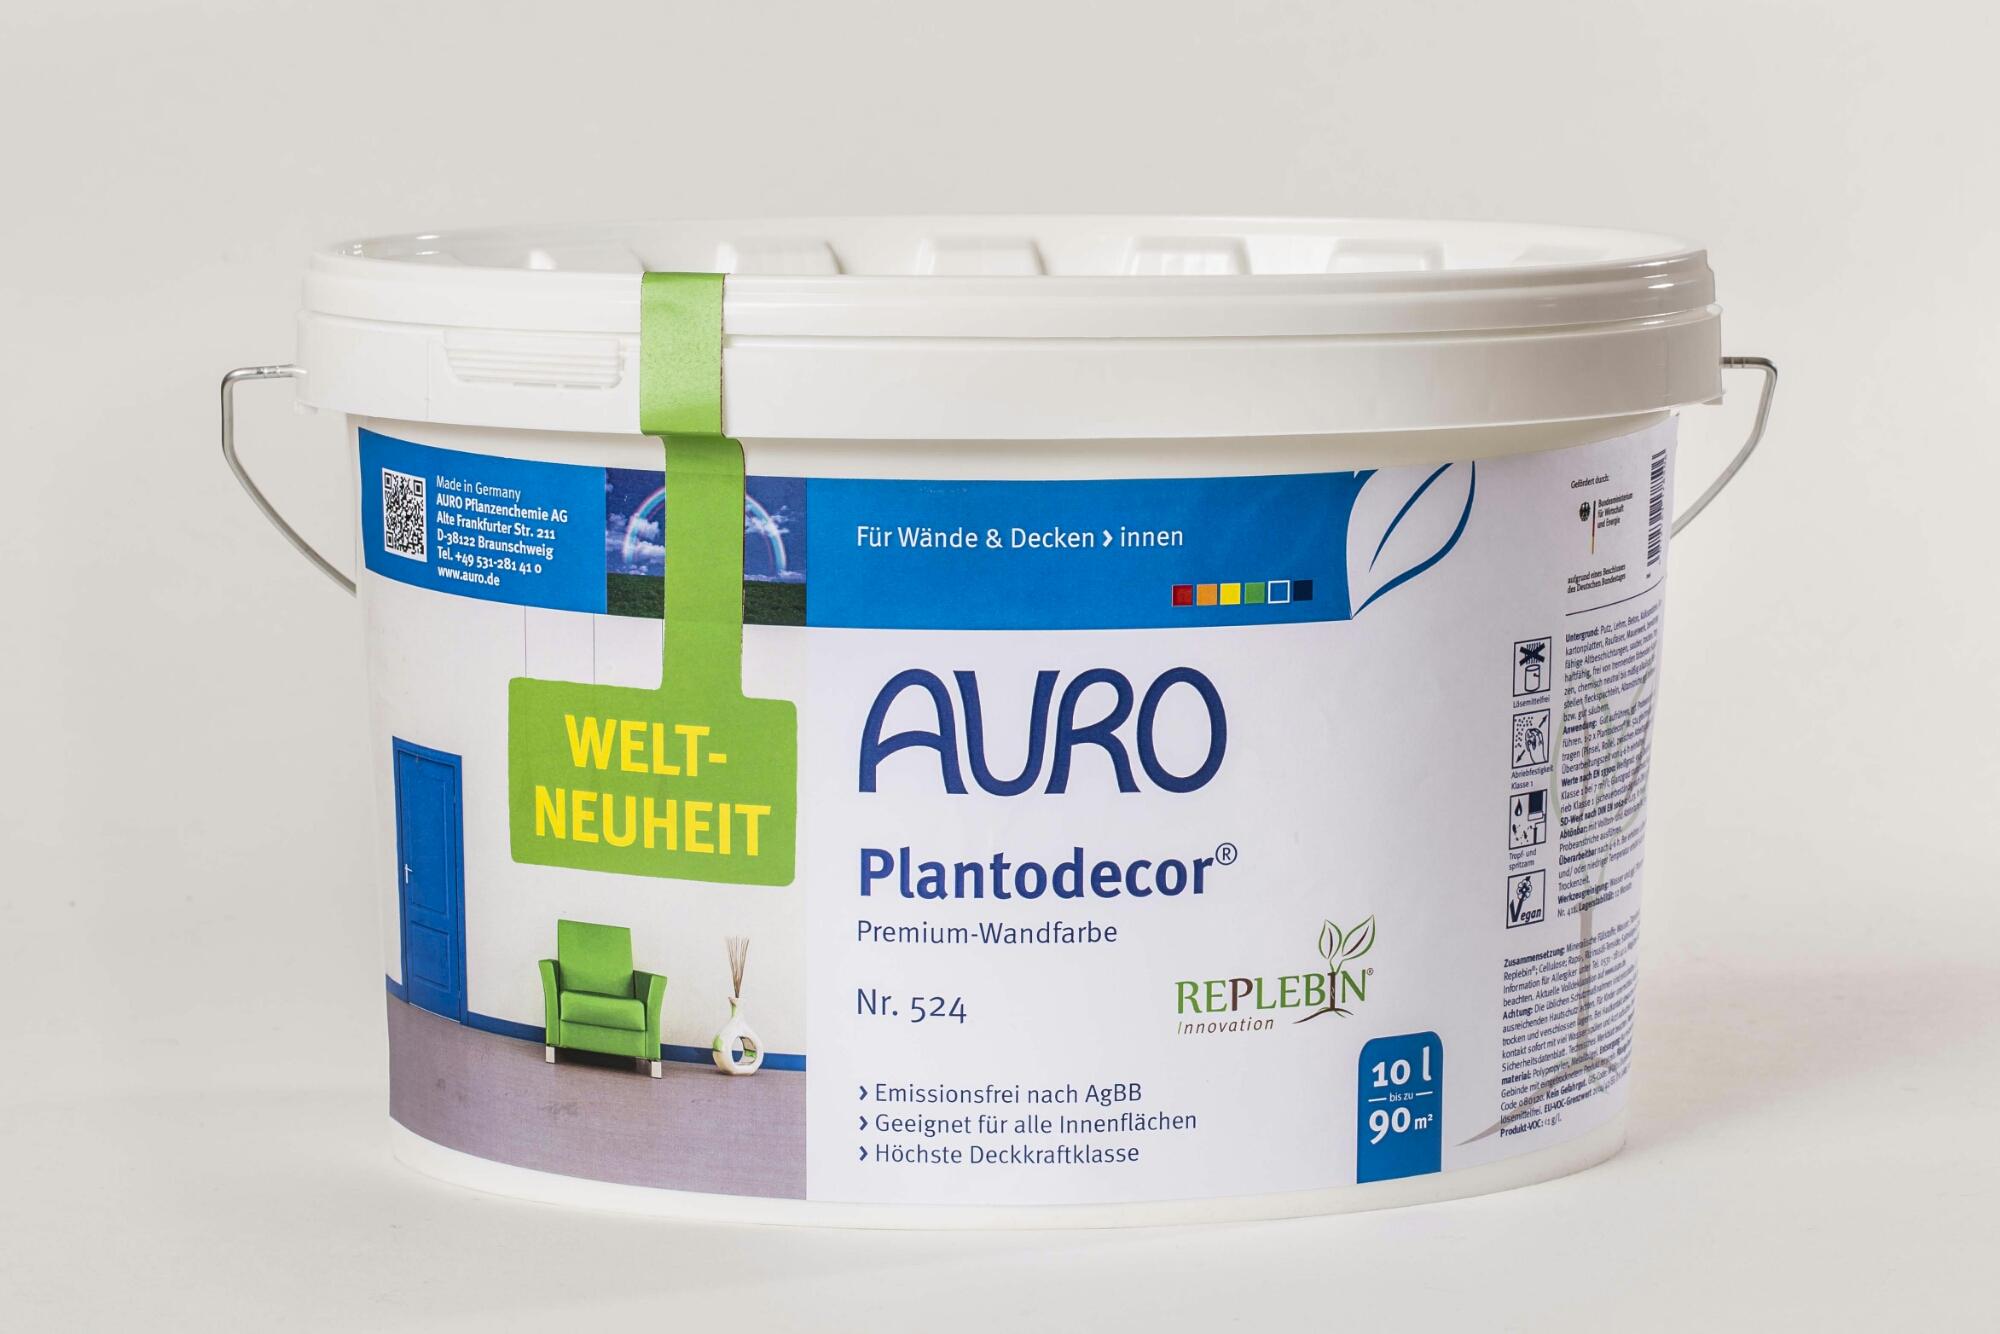 wpid-auro_premium-wandfarbe-plantodecor_plantodecor.jpg